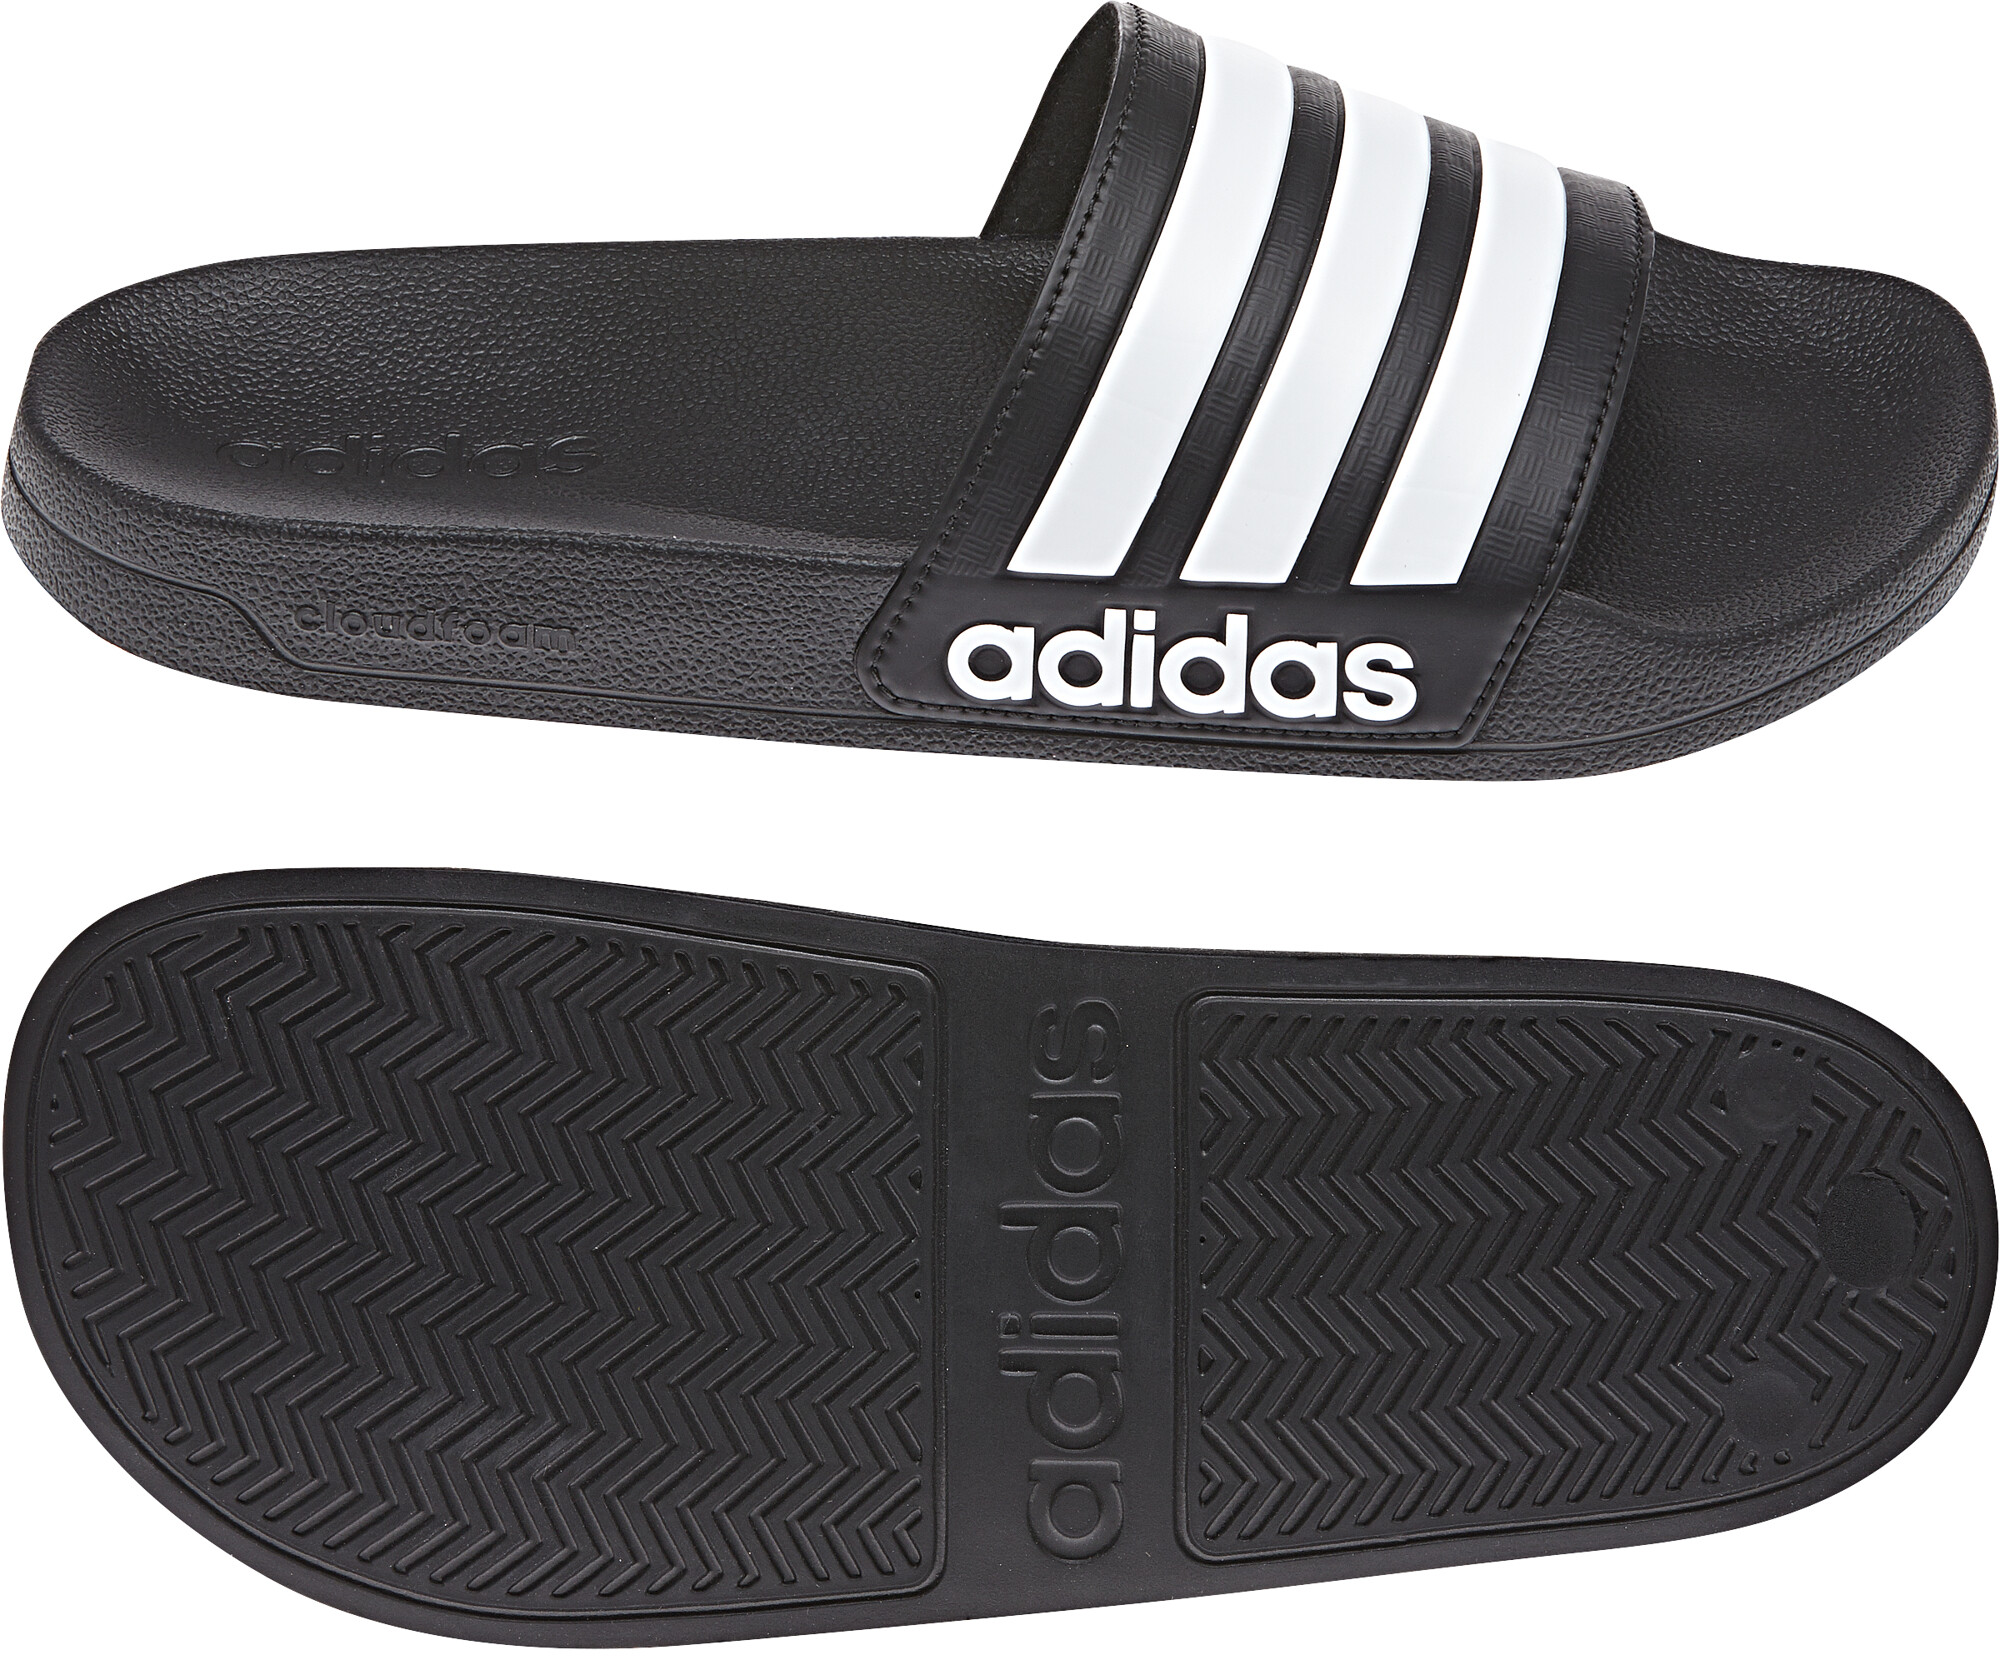 adidas Adilette Shower Slipper Herren scarletfootwear whitescarlet Schuhgröße UK 6 | EU 39 13